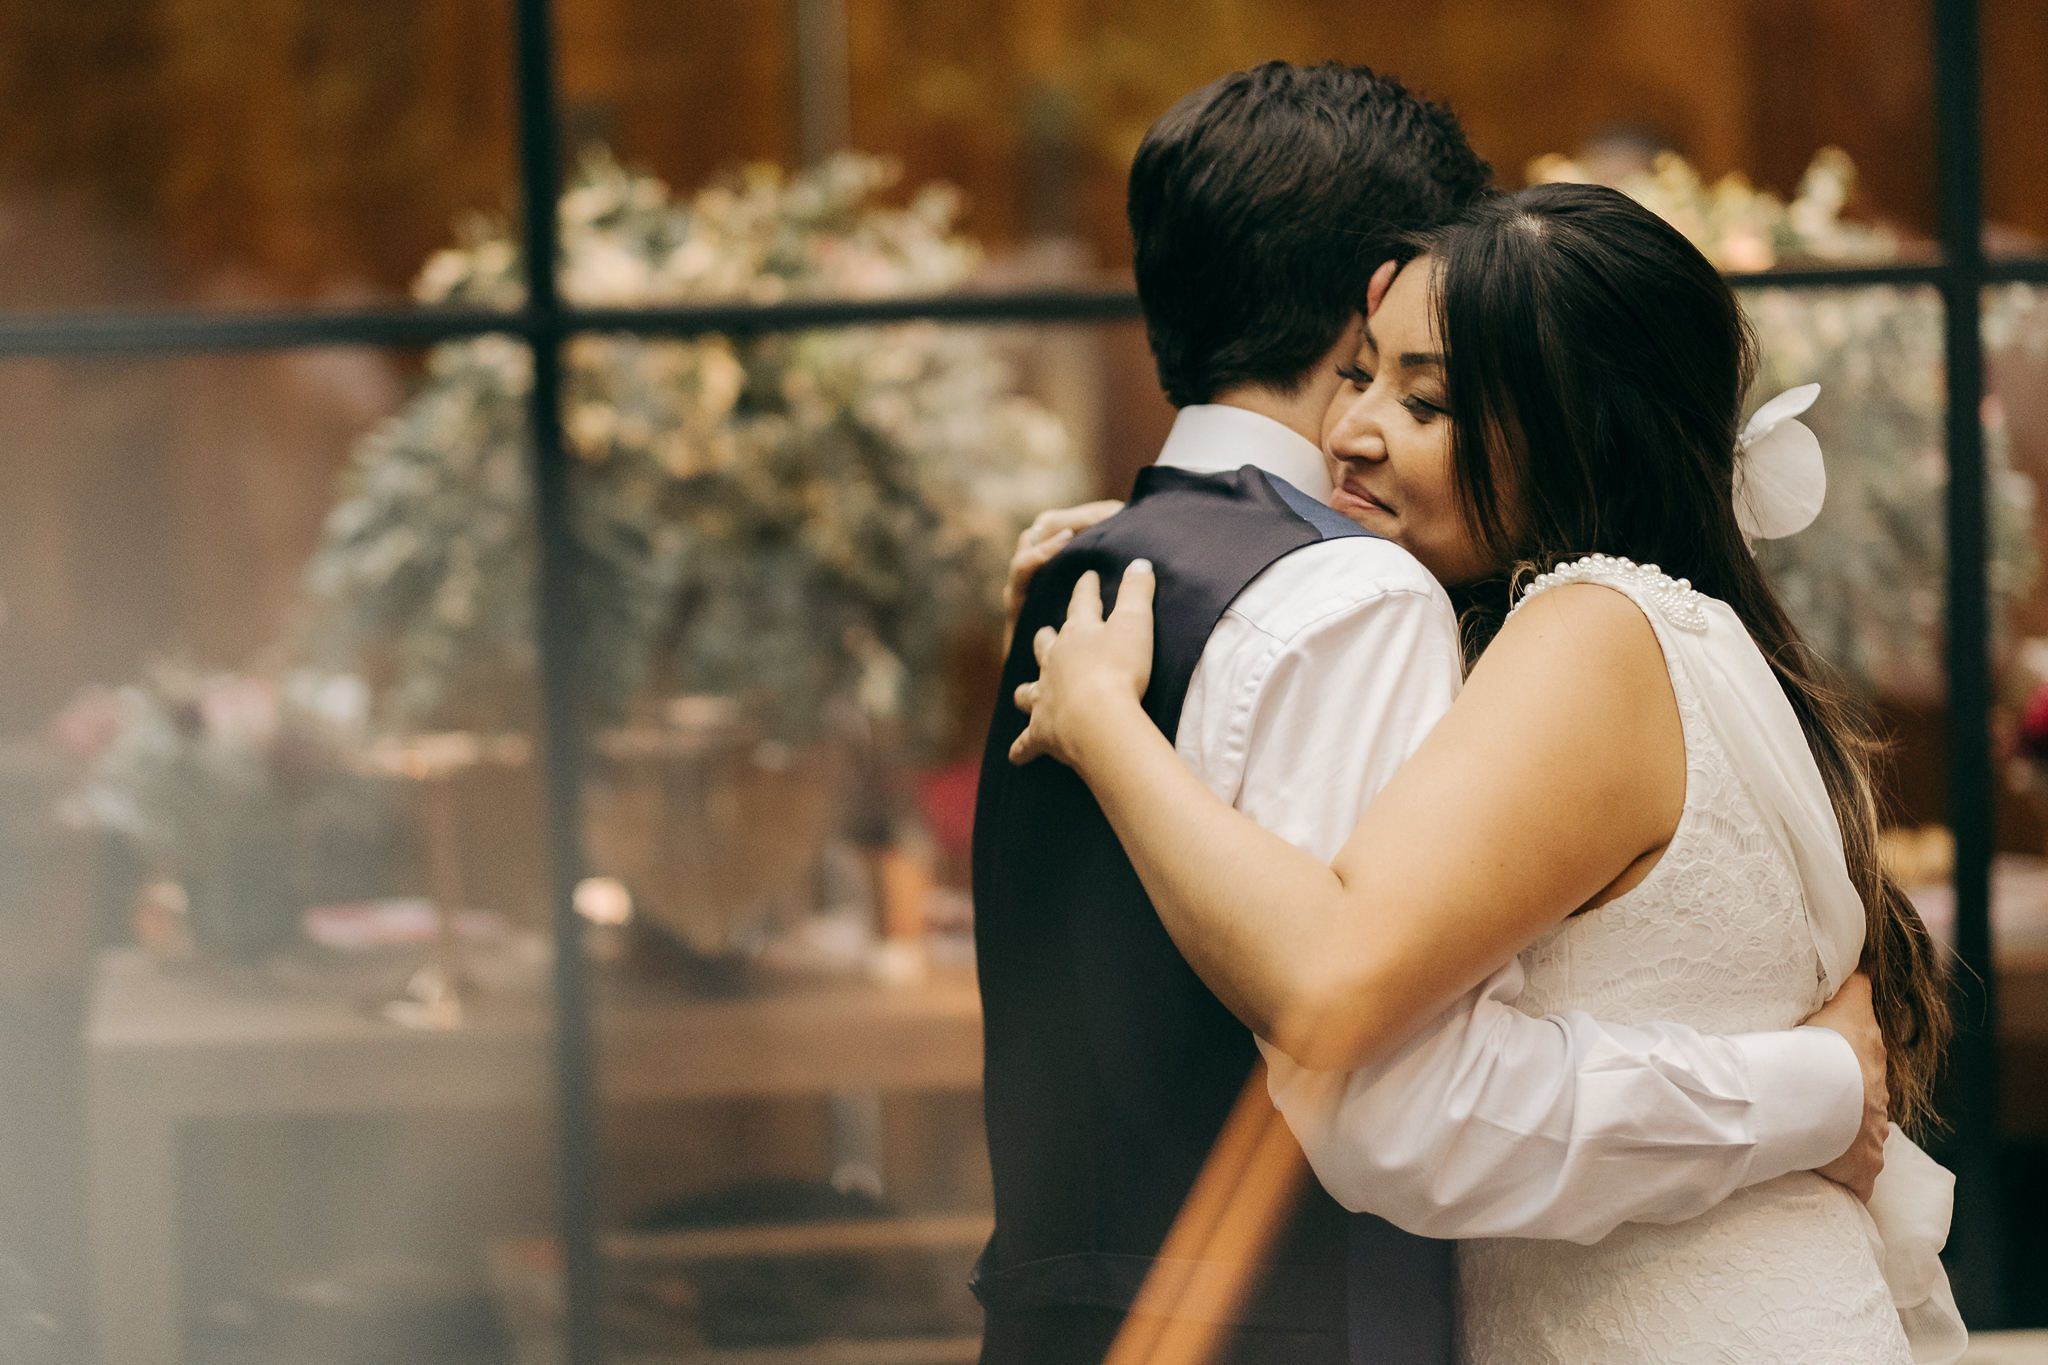 miniwedding romântico em um restaurante